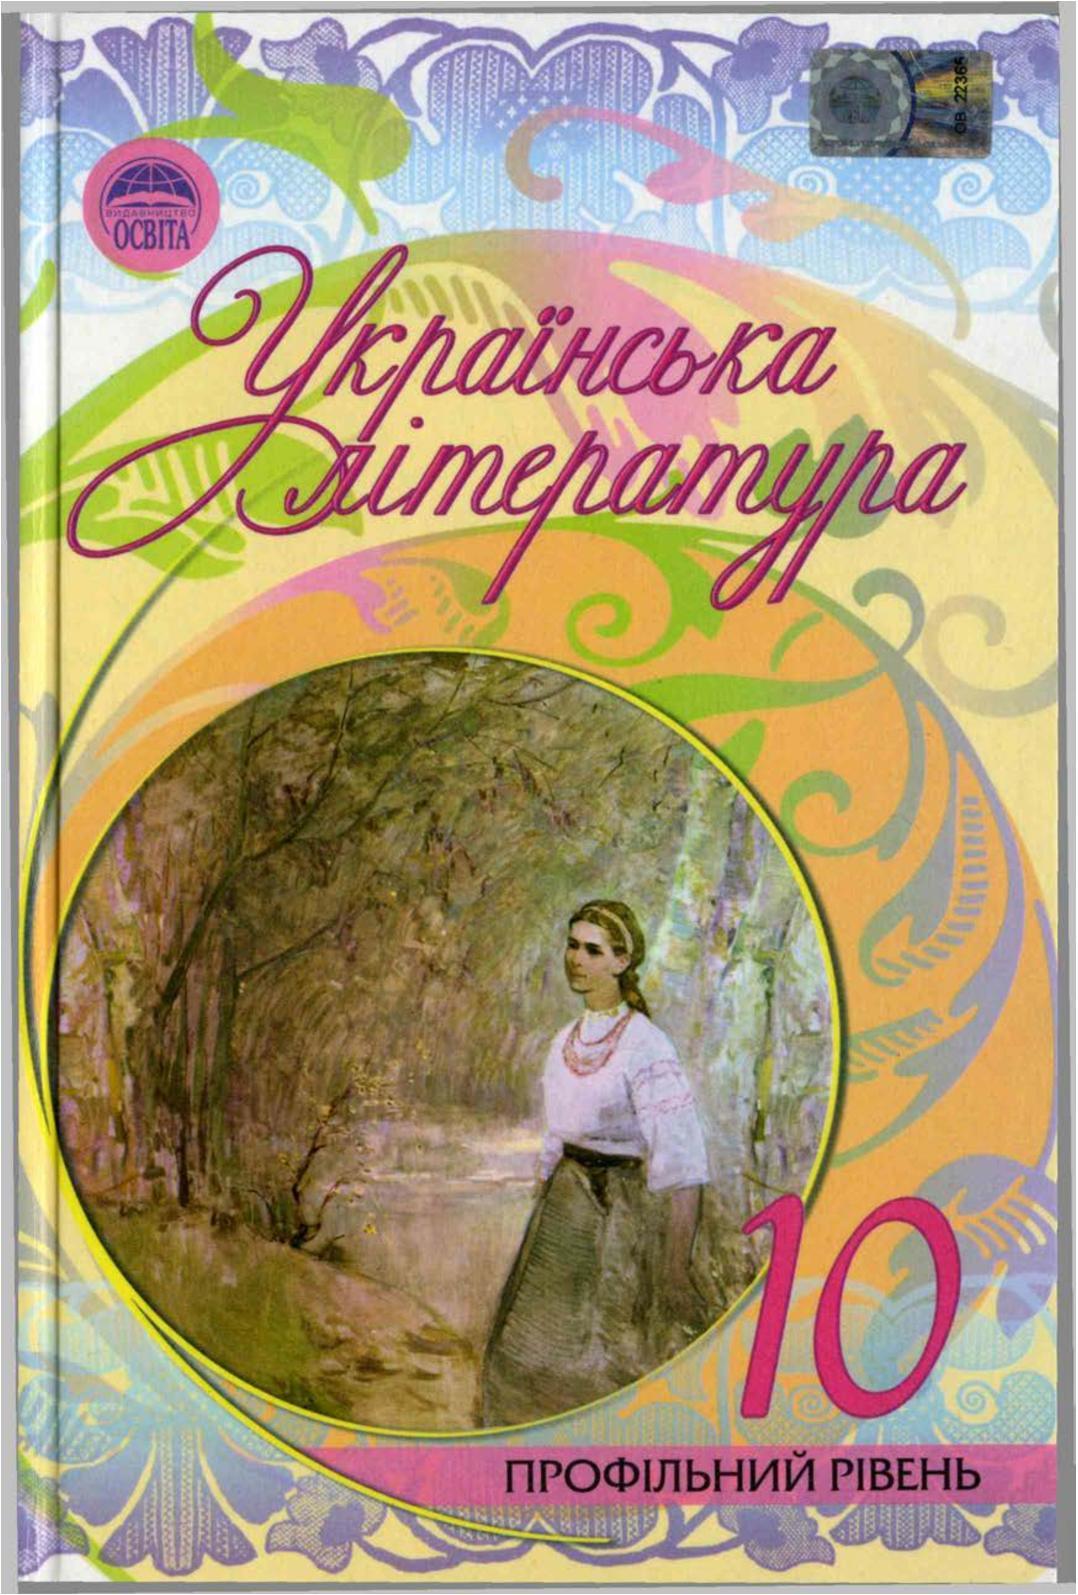 Calaméo - 10 класс. Украинский литература Semenjuk 2010 Prof 55cc10a326715